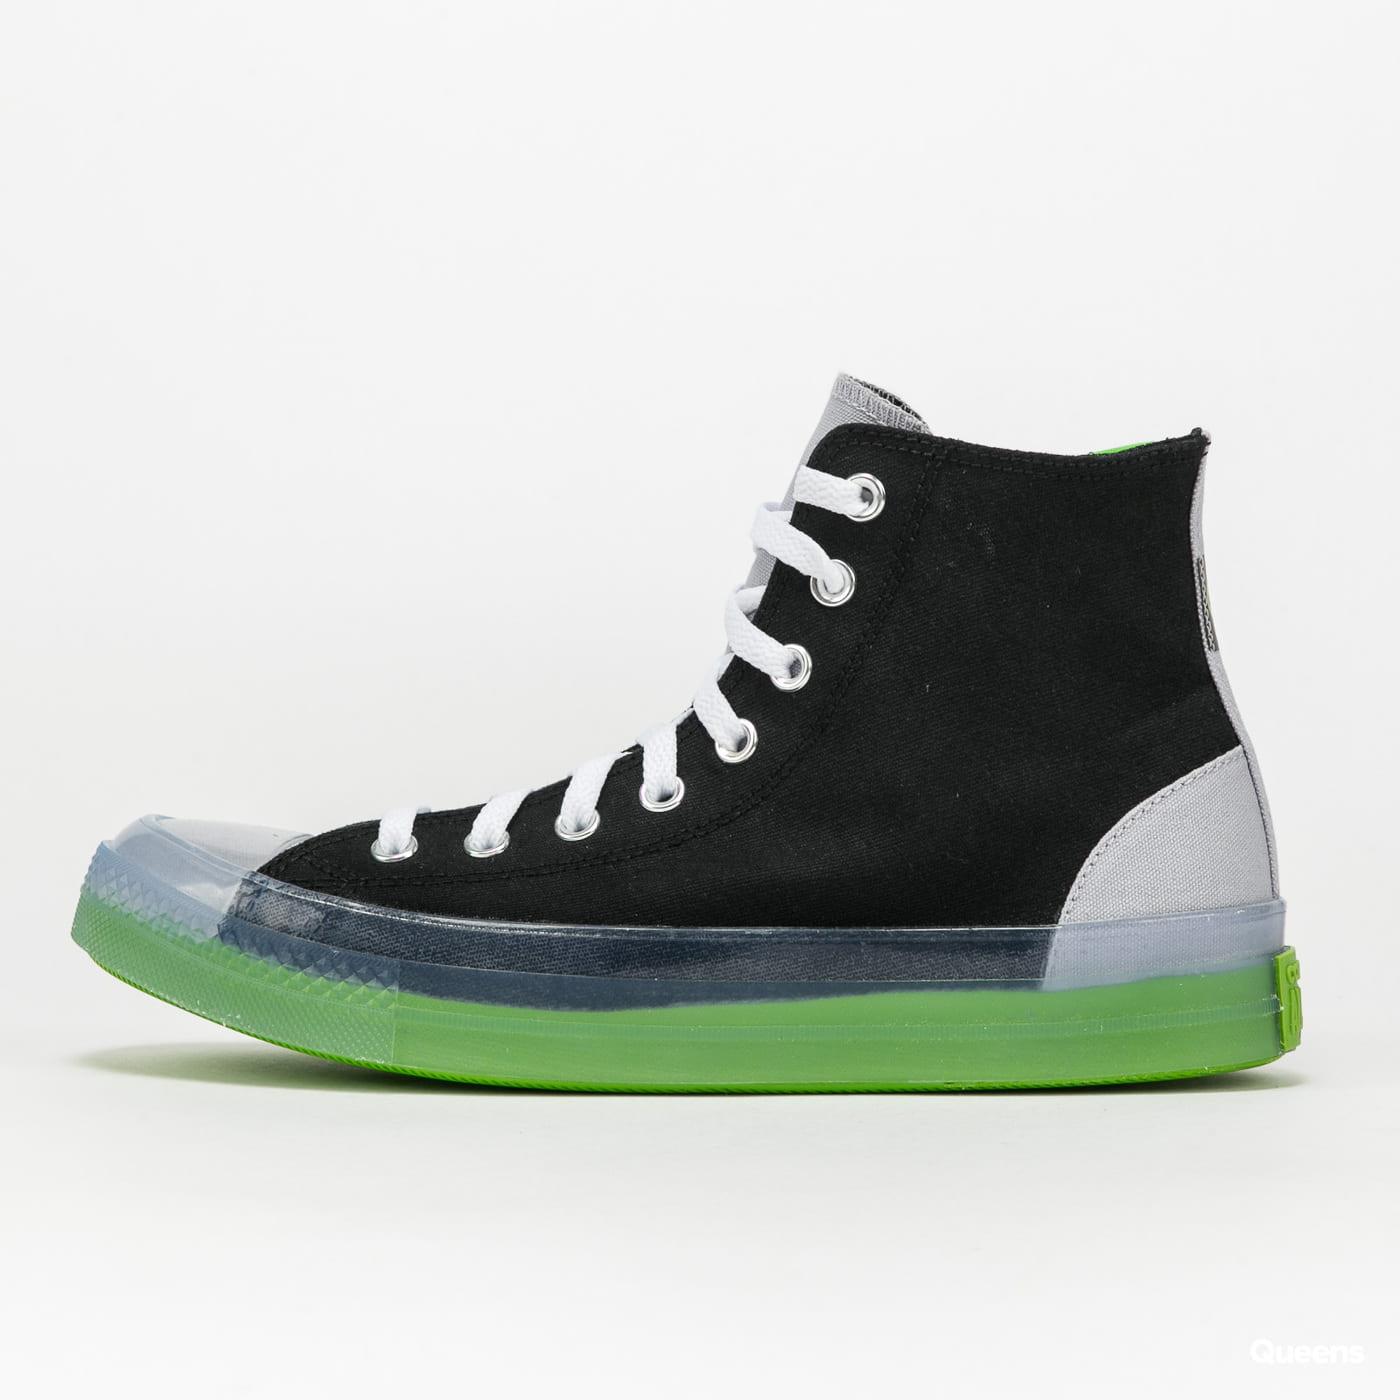 Converse Chuck Taylor All Star CX HI black / gravel / bold wasabi